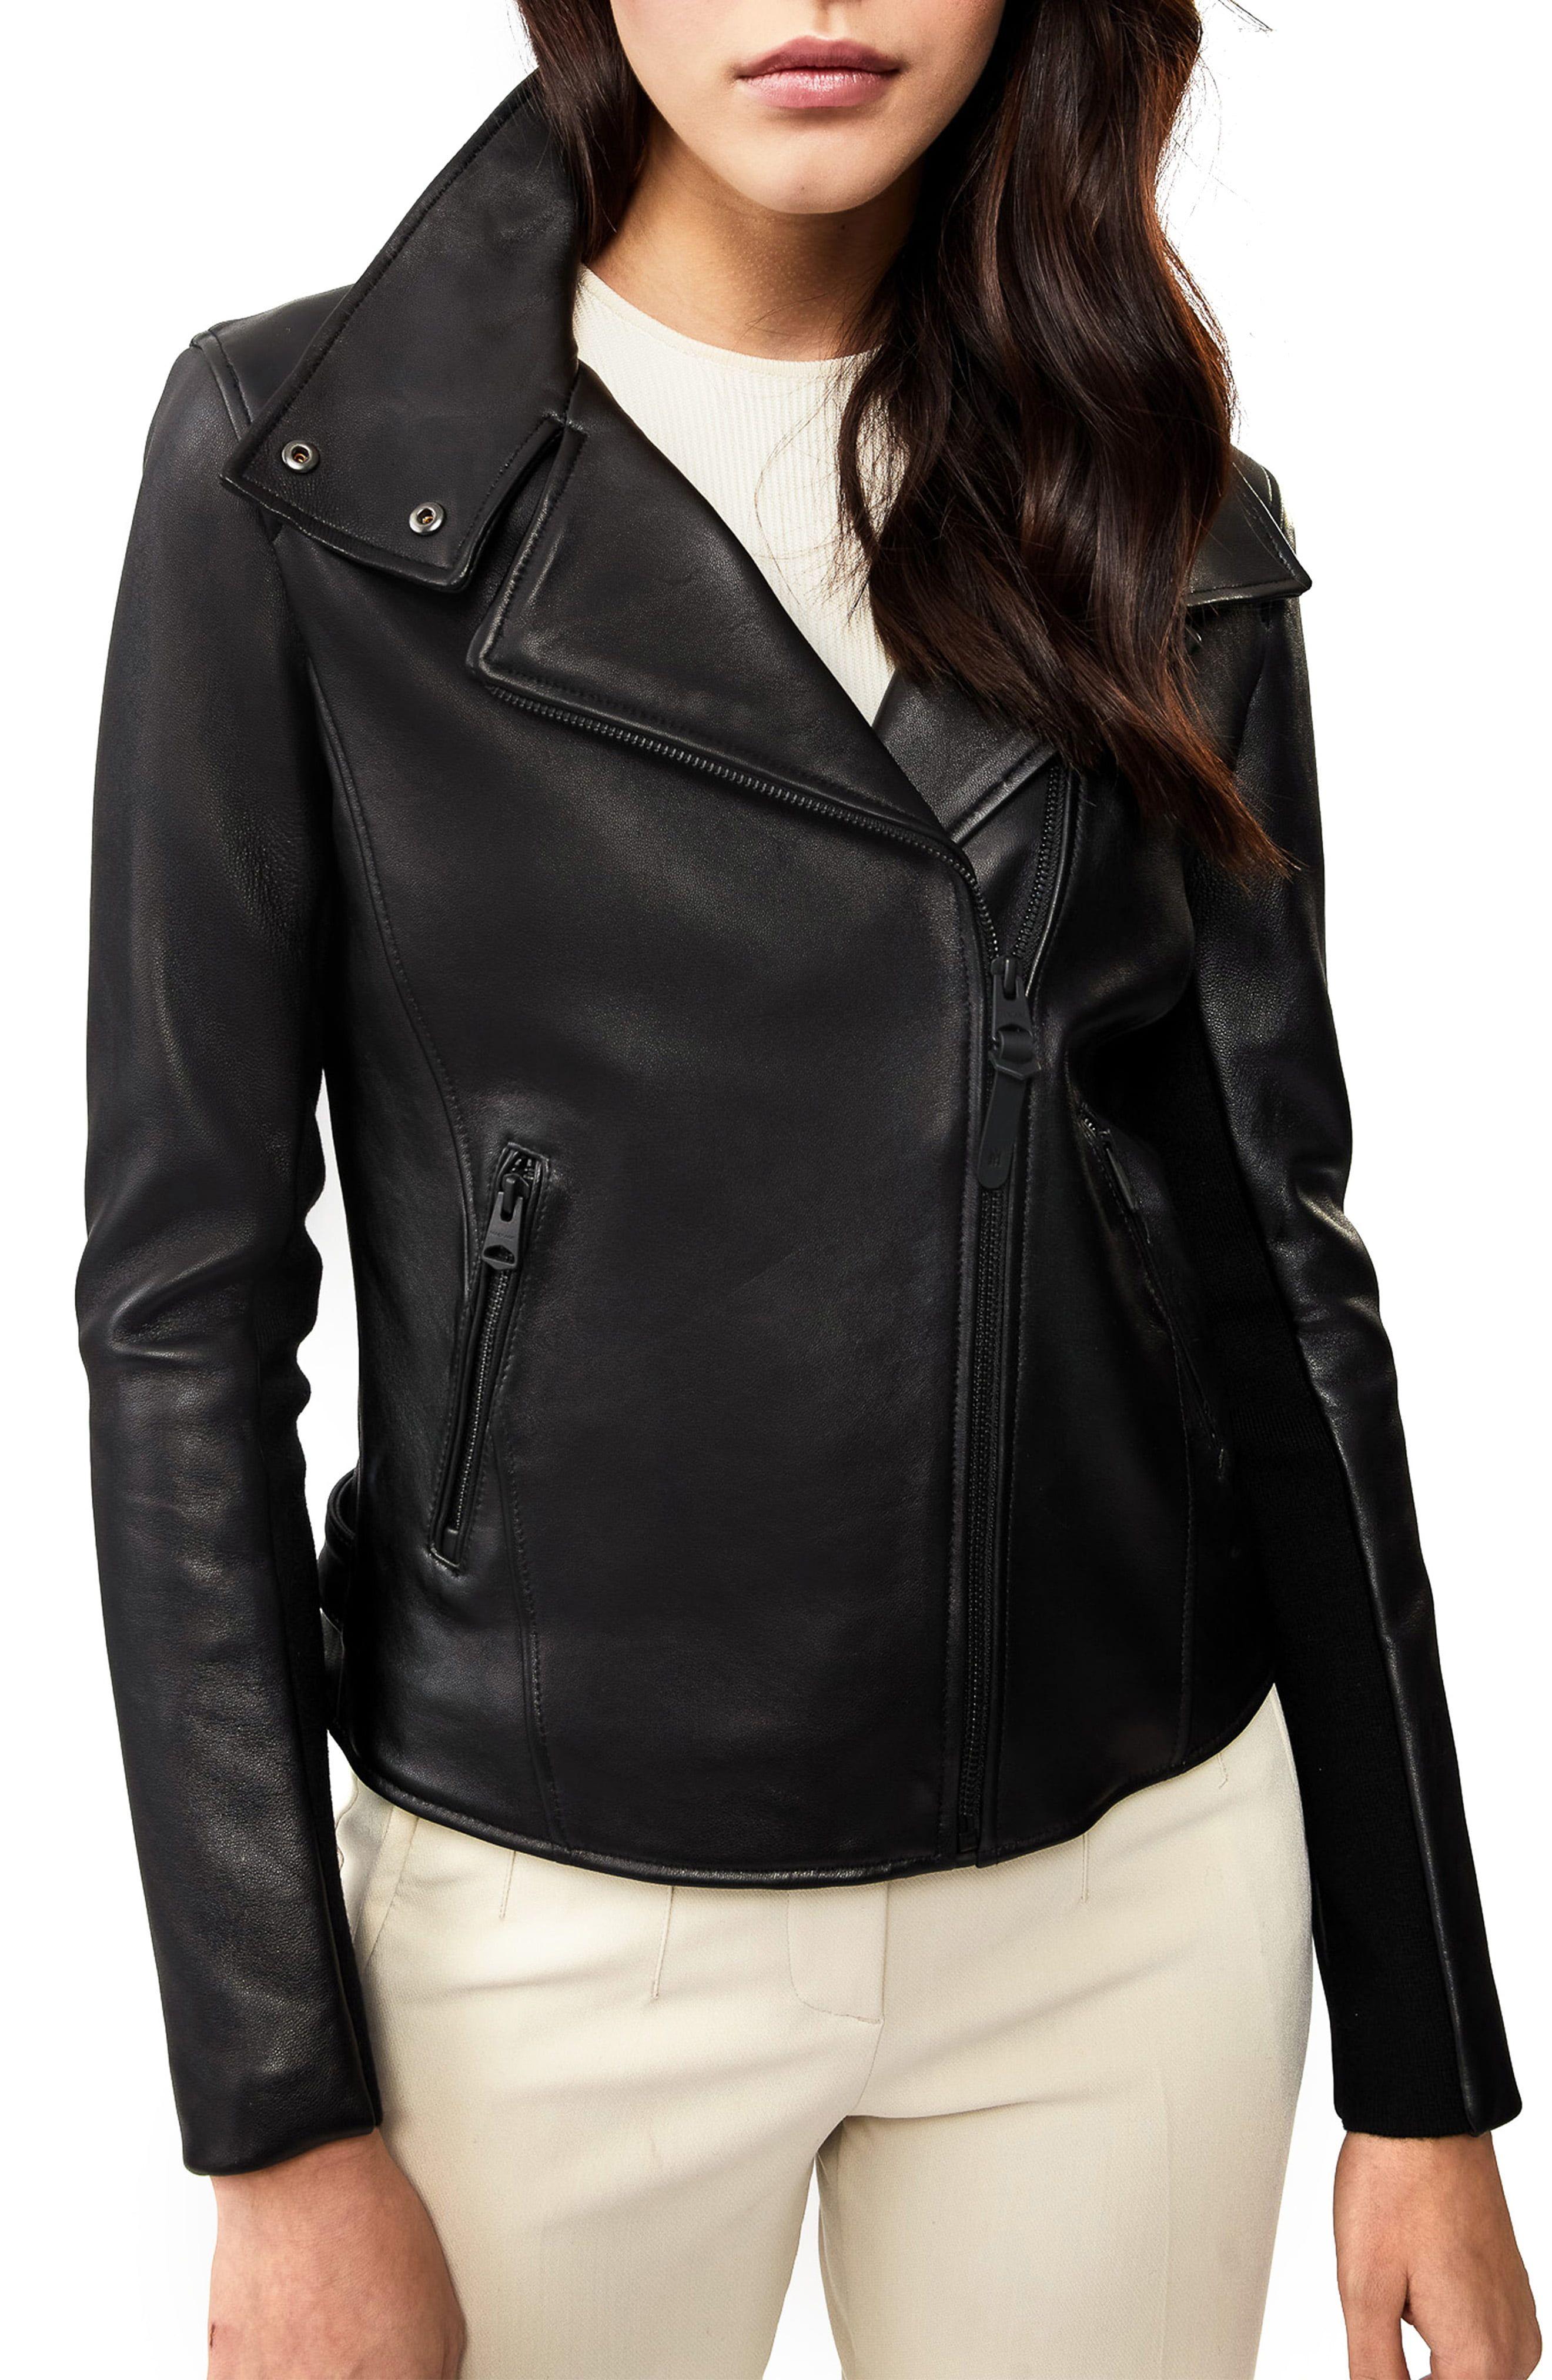 Mackage Sandy Leather Moto Jacket Nordstrom In 2020 Leather Moto Jacket Leather Jackets Women Black Leather Moto Jacket [ 4048 x 2640 Pixel ]